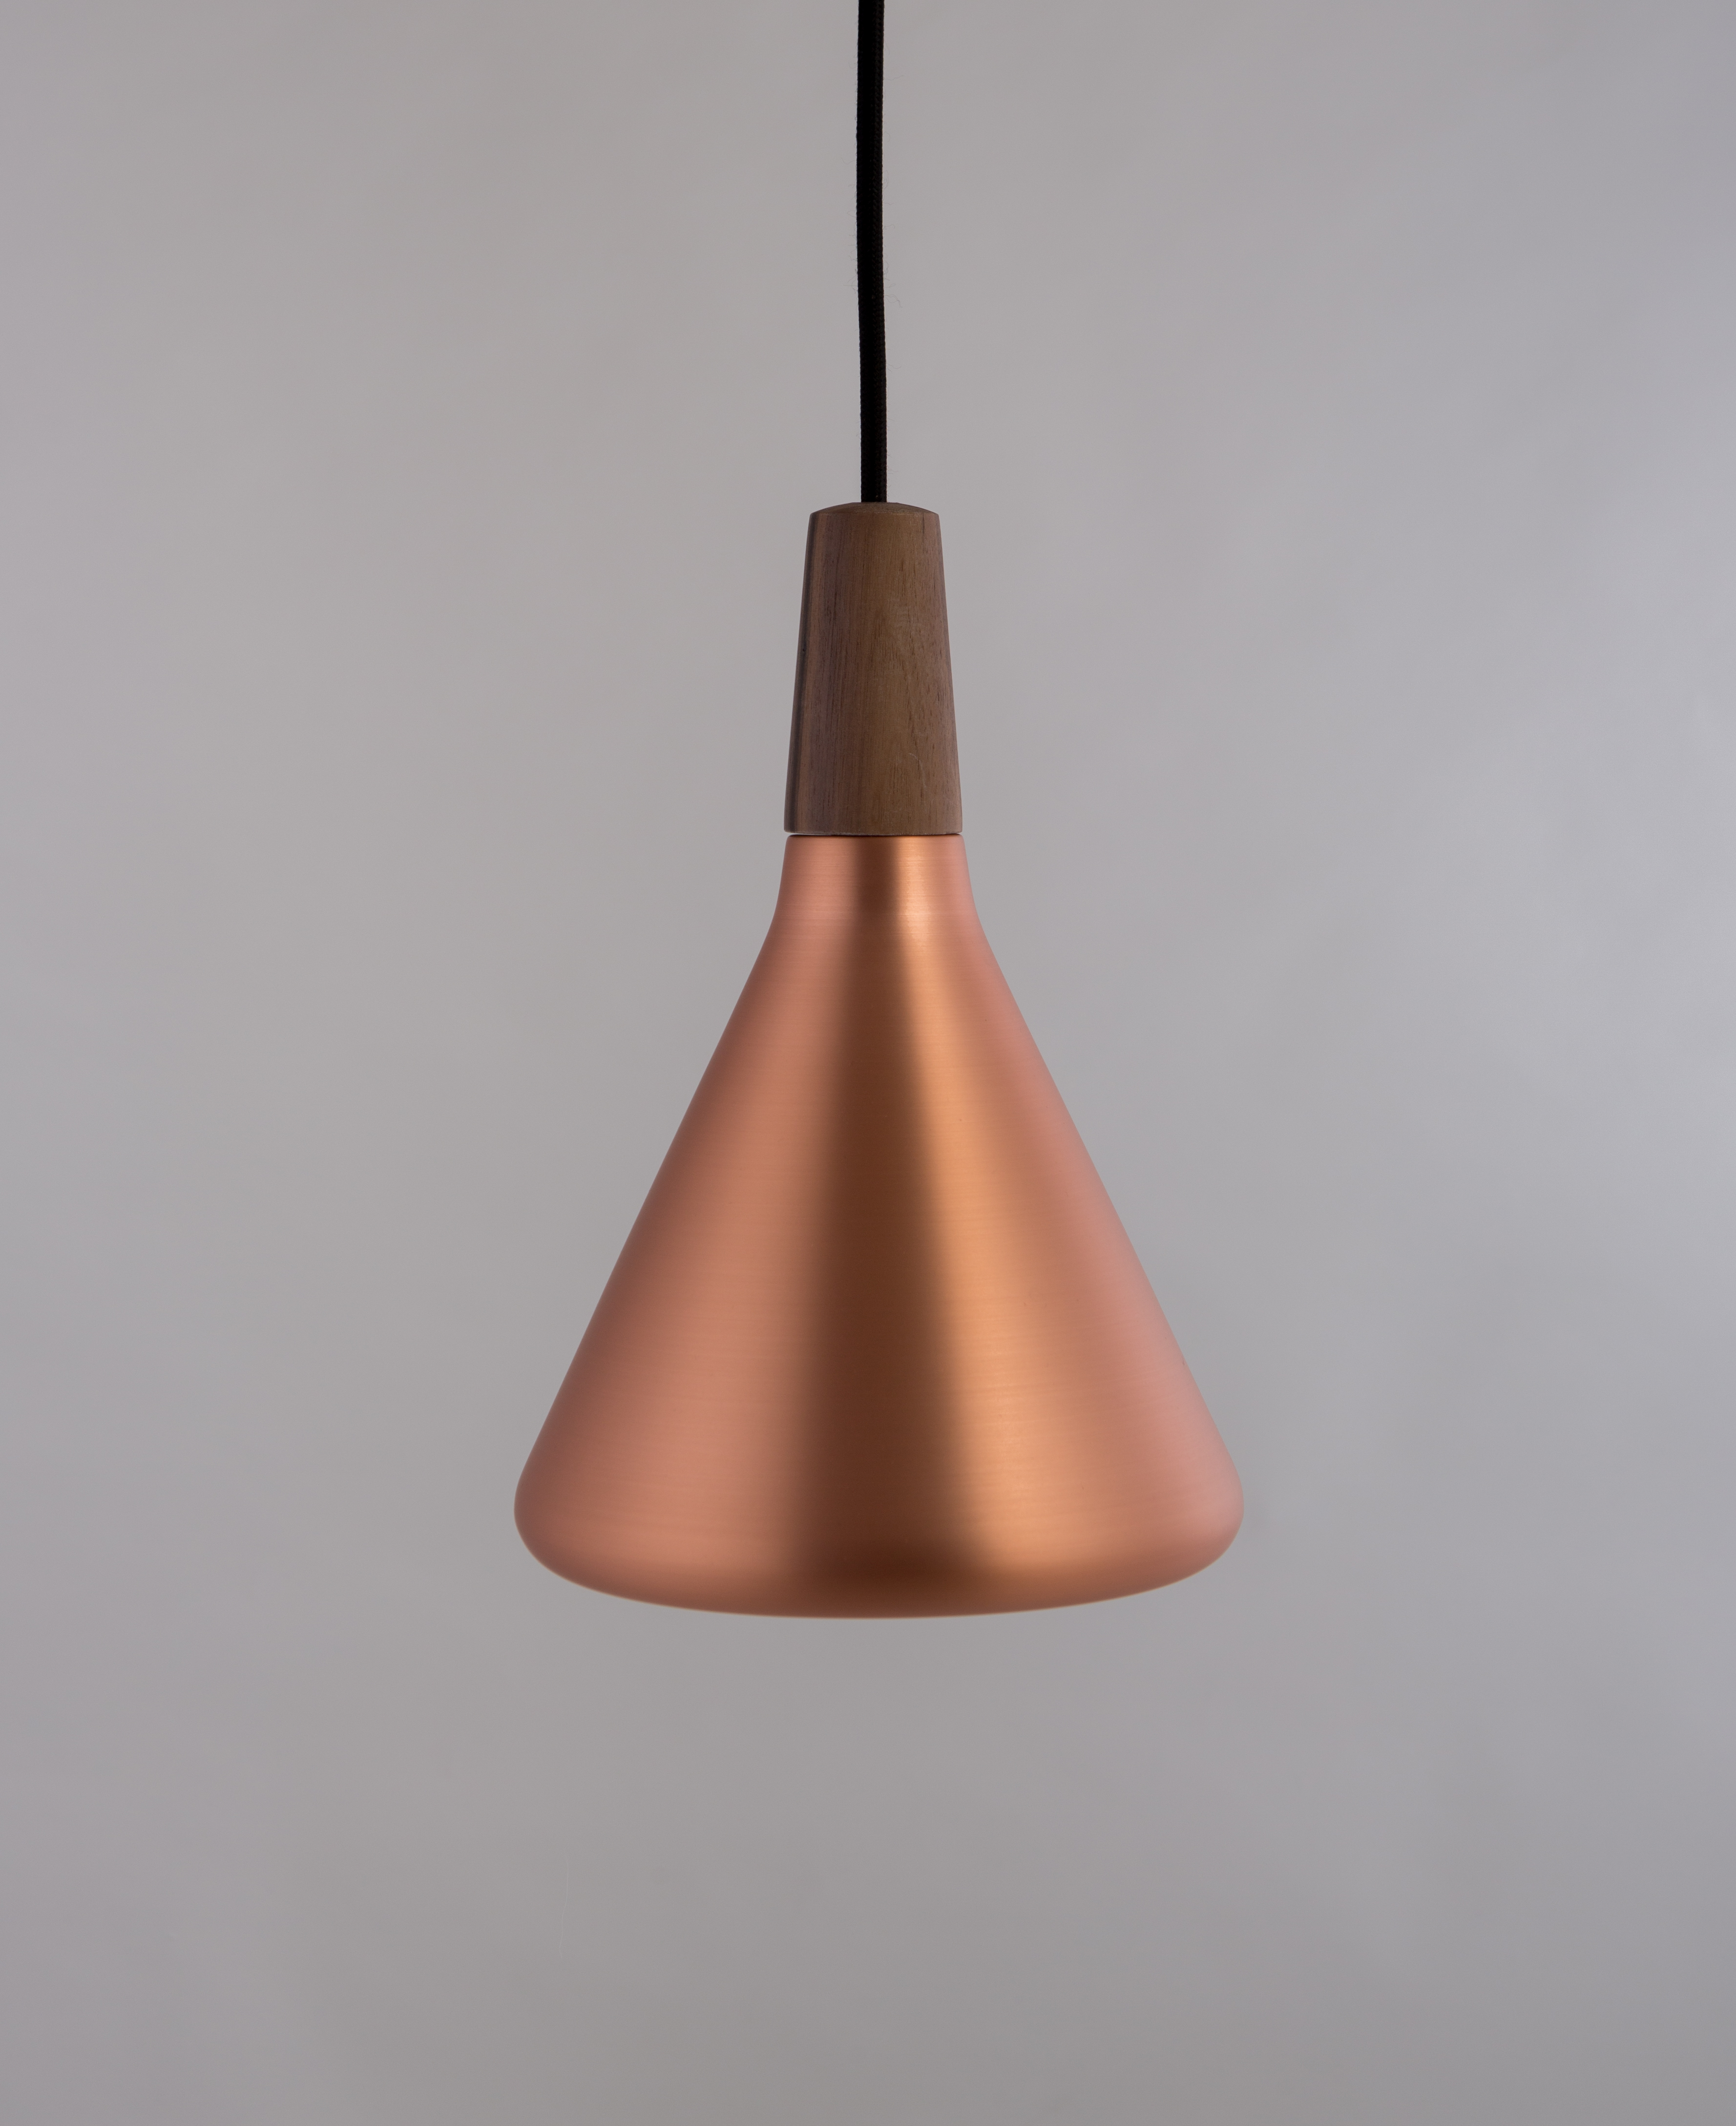 danish lighting fredrik . danish lighting fredrik   copper  steel pendant light